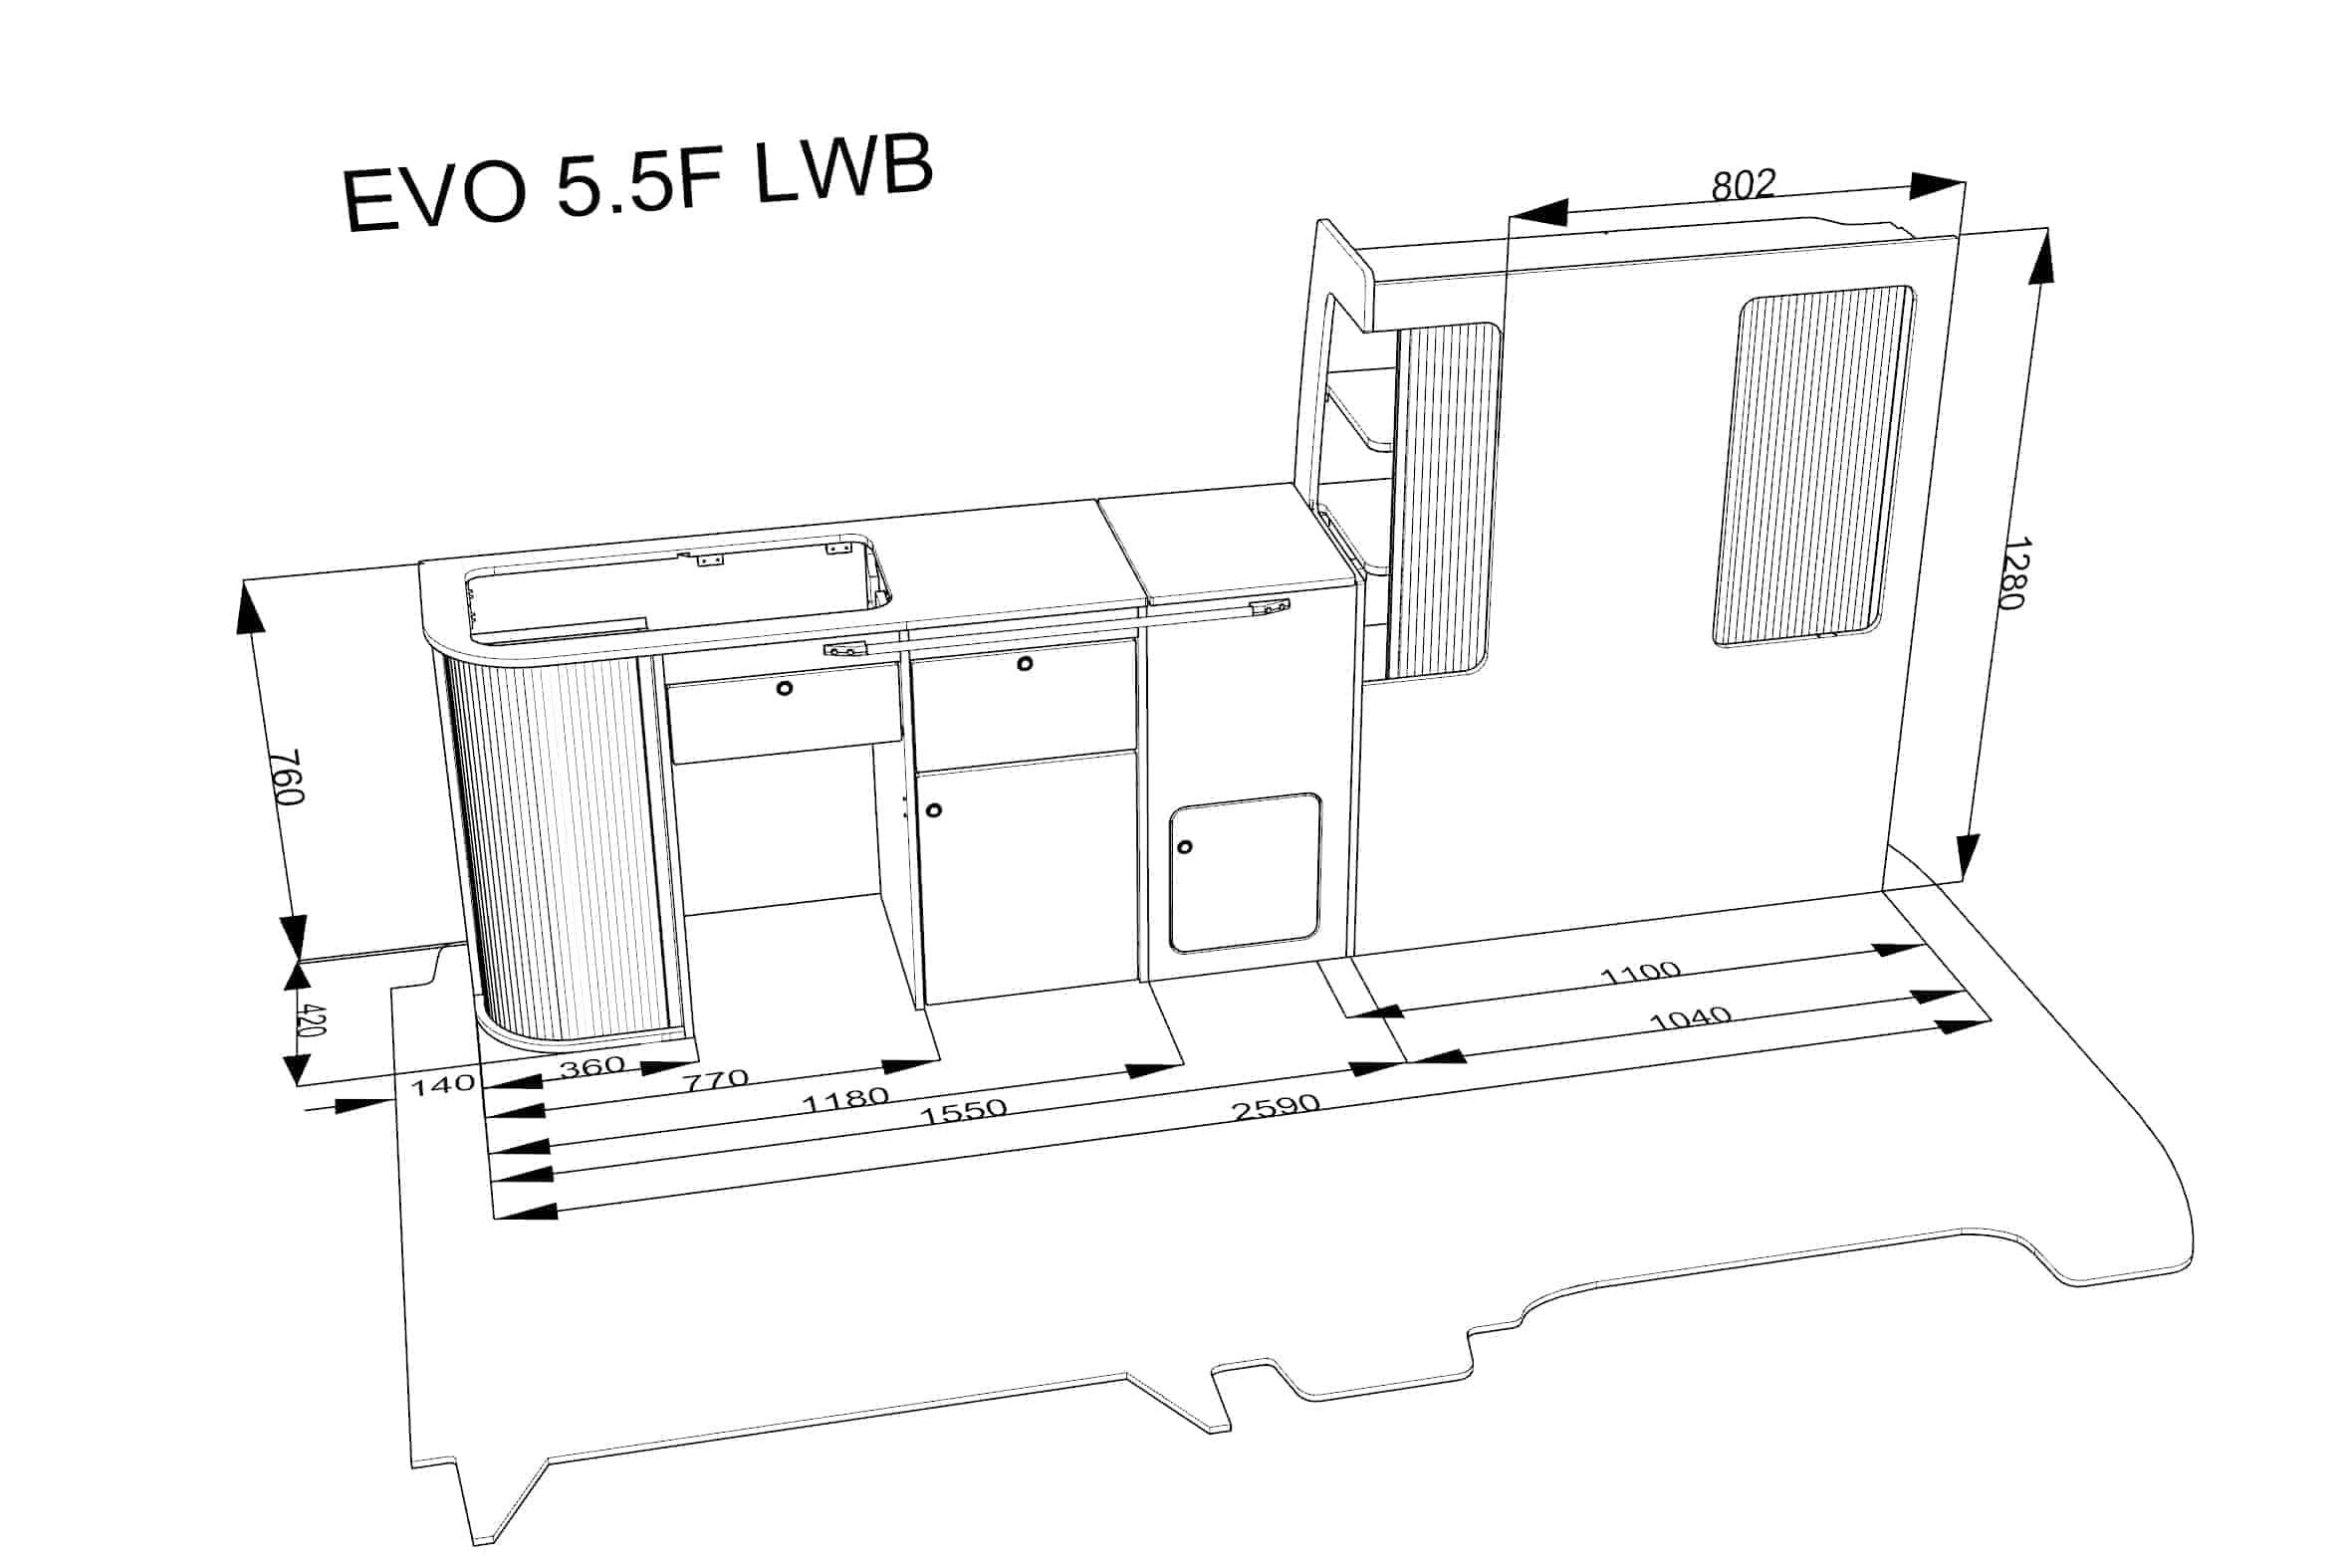 evo 5 5f  u2013 curved kit  u2013 front loading fridge  u2013 long wheel